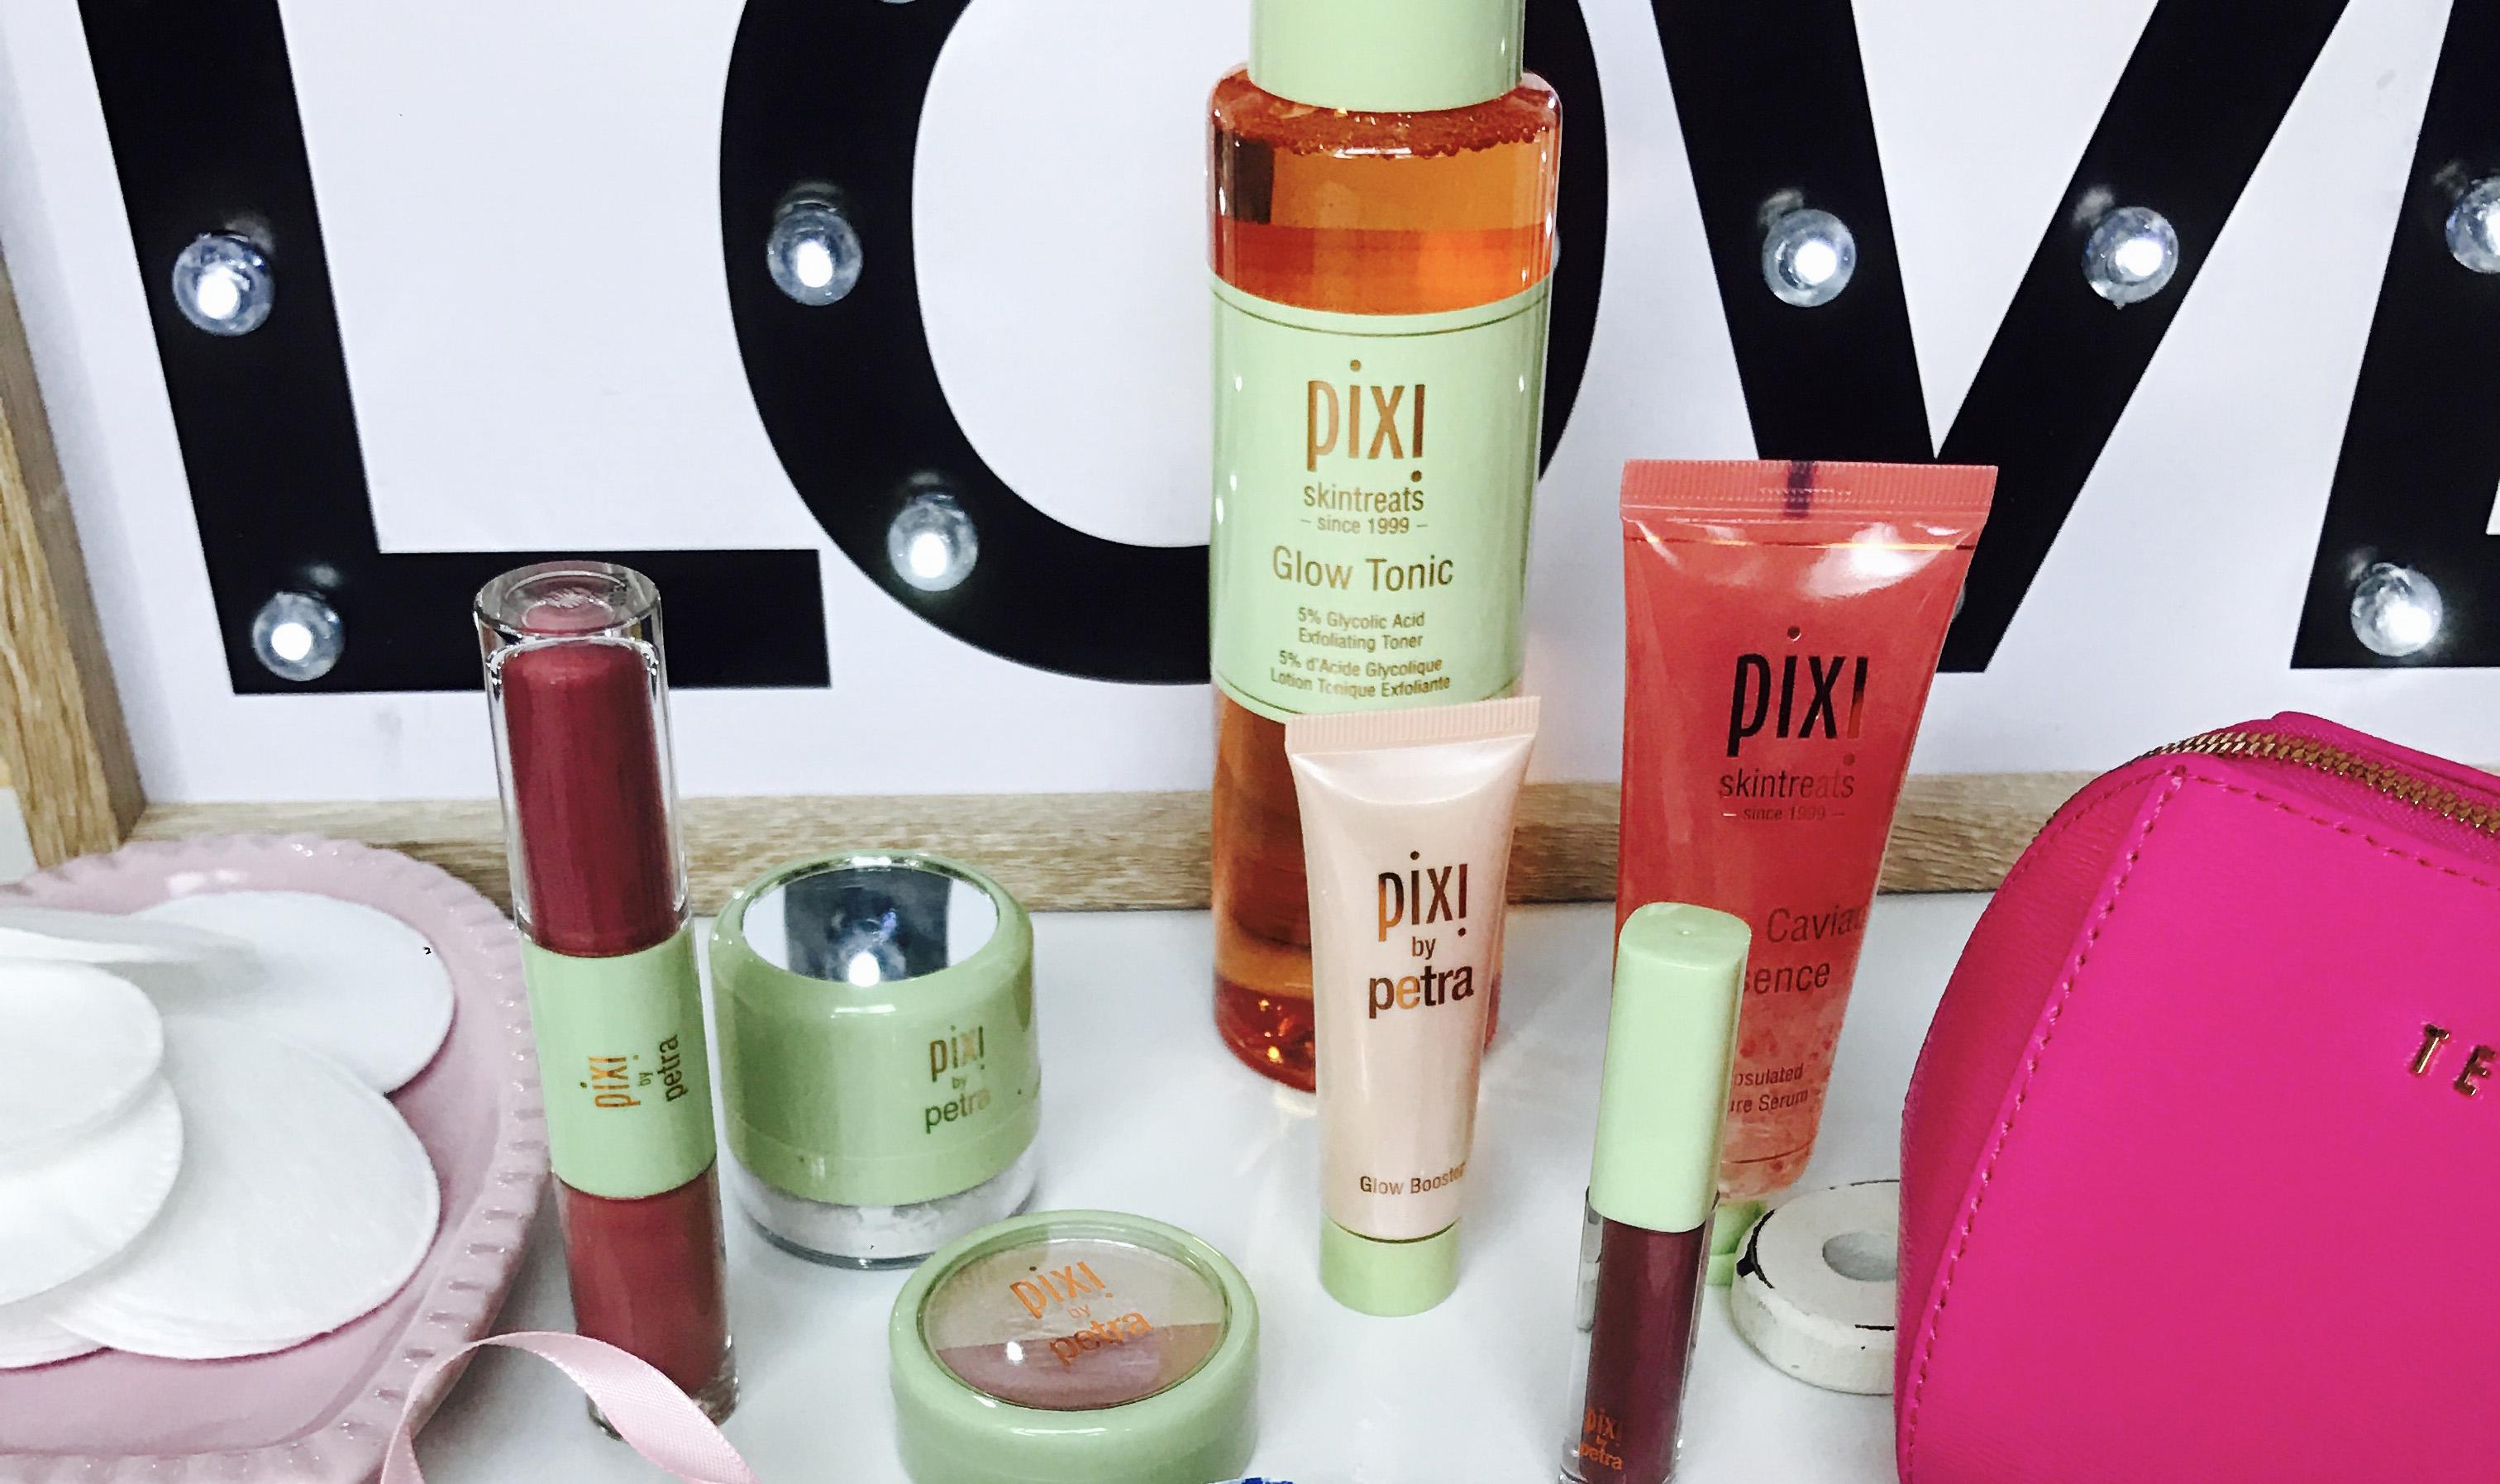 (Español) Descubriendo la cosmética de Pixi Beauty